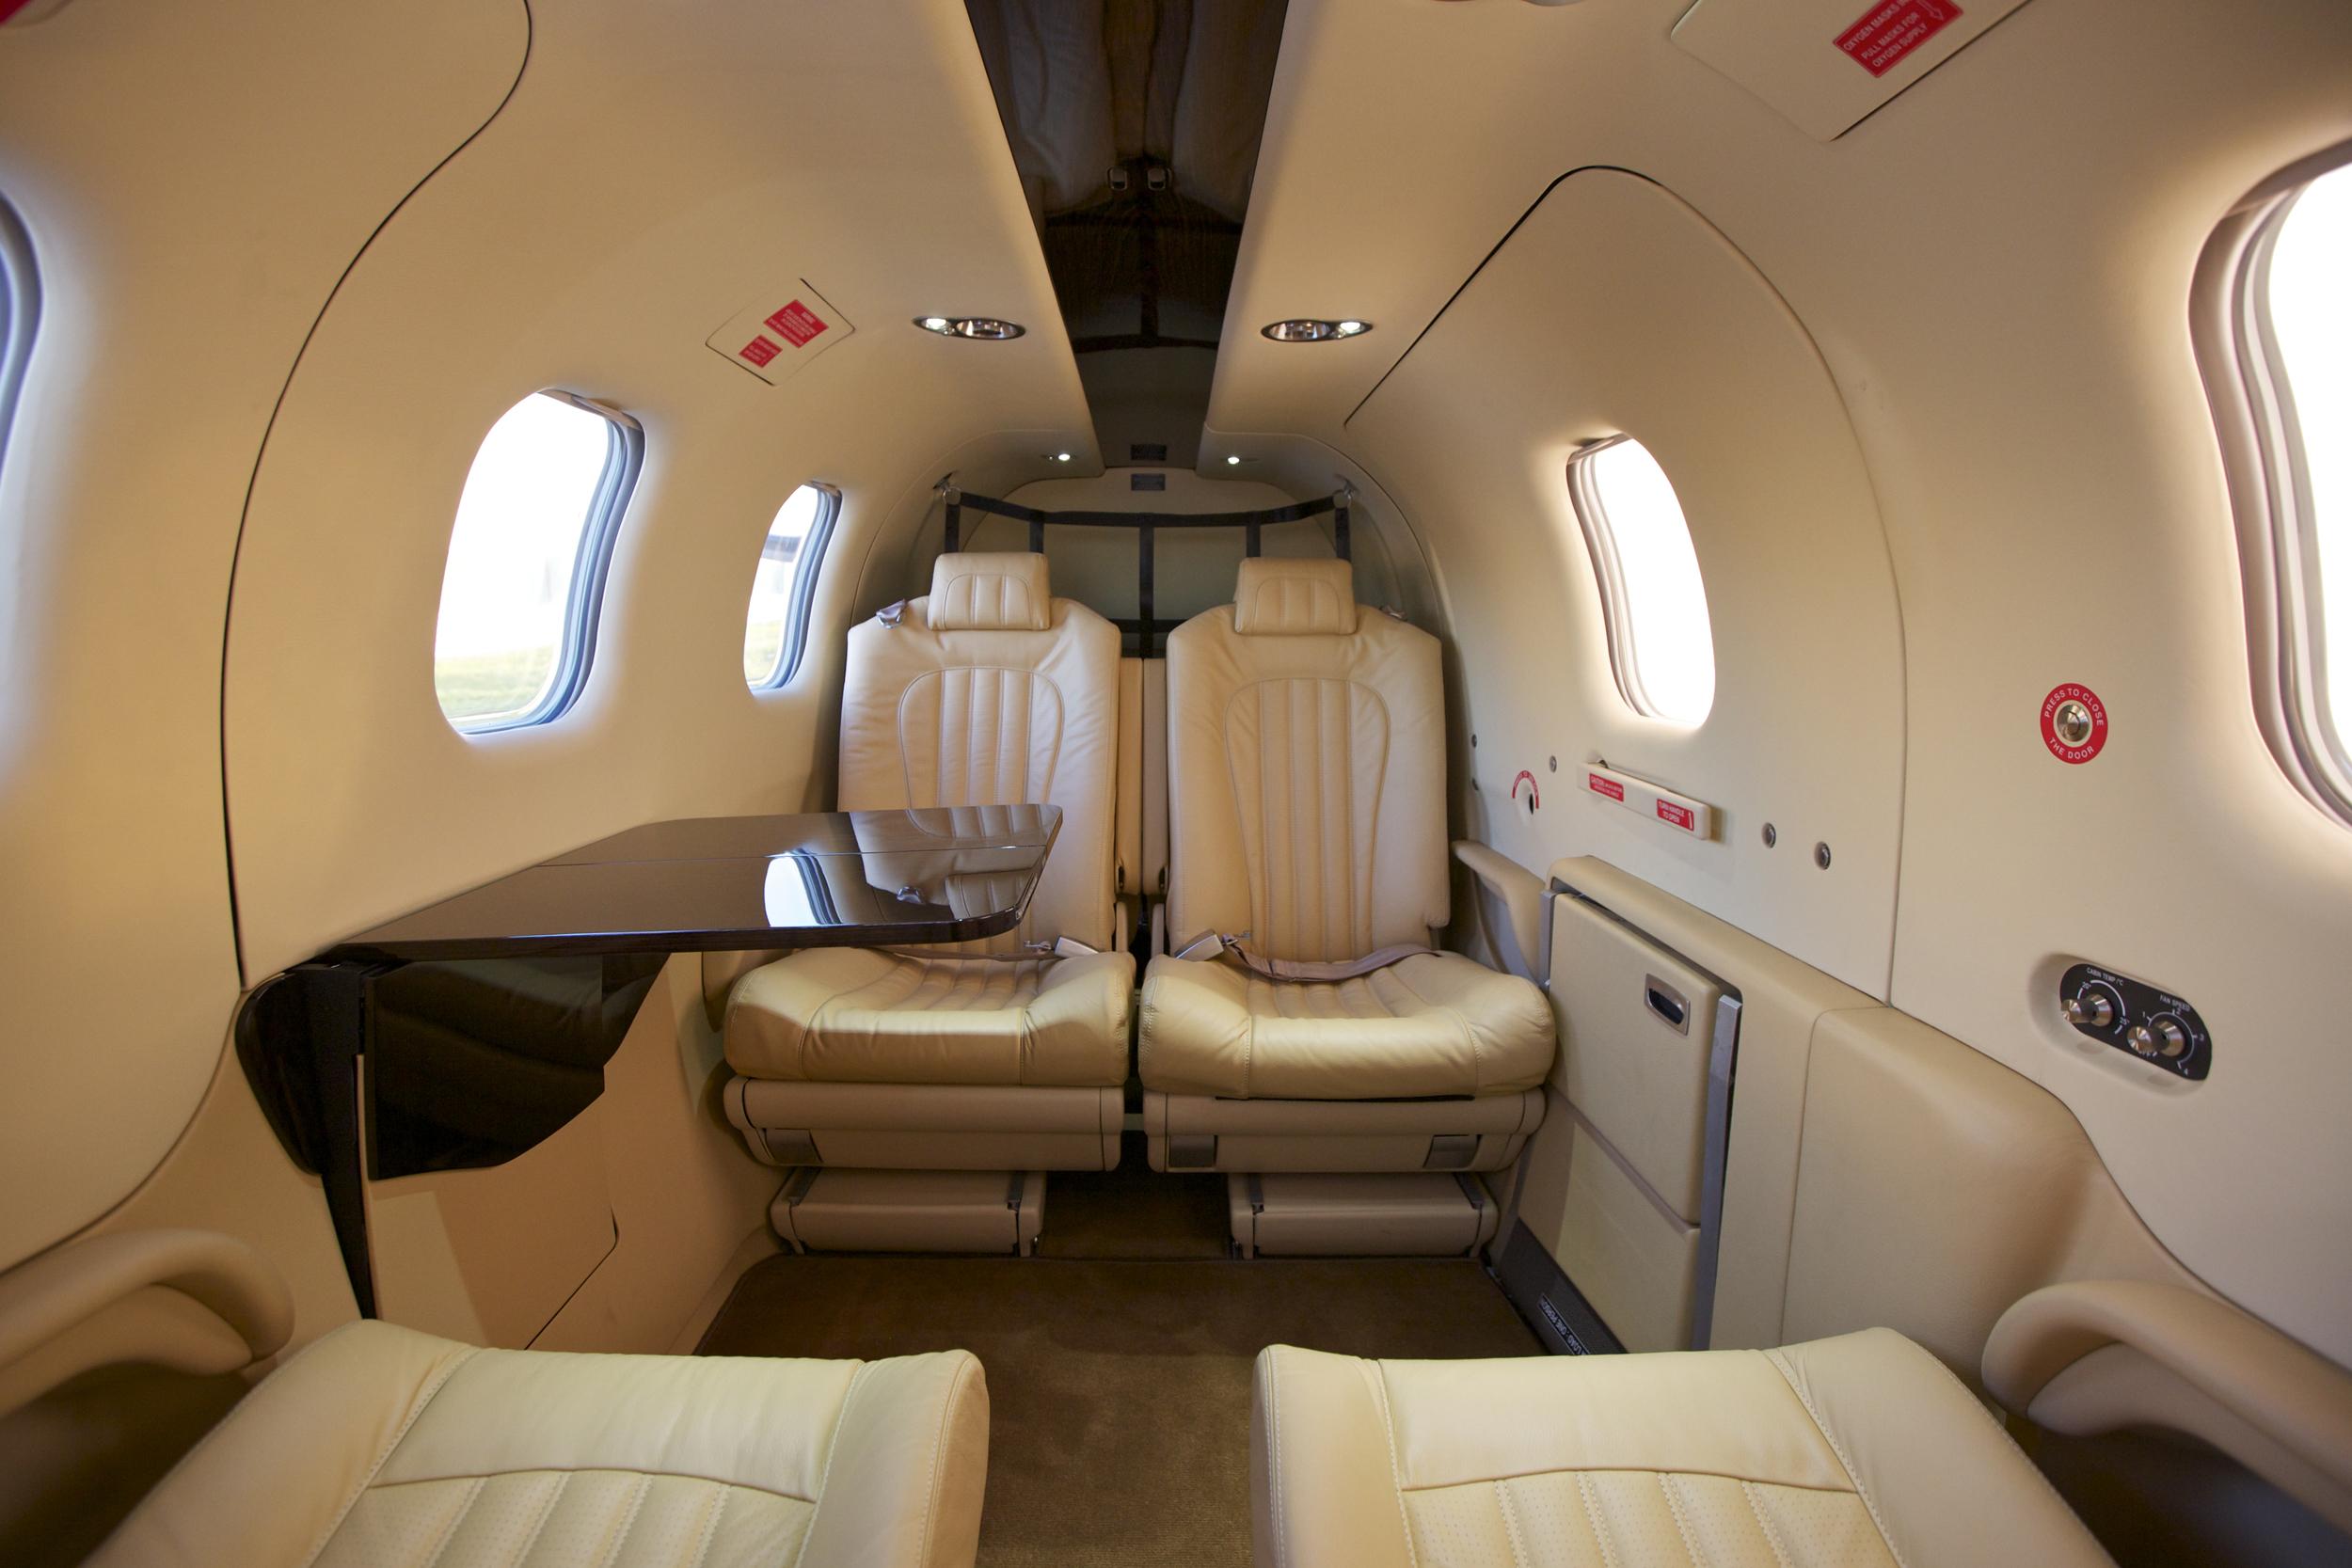 Spacious cabin class comfort & luxury